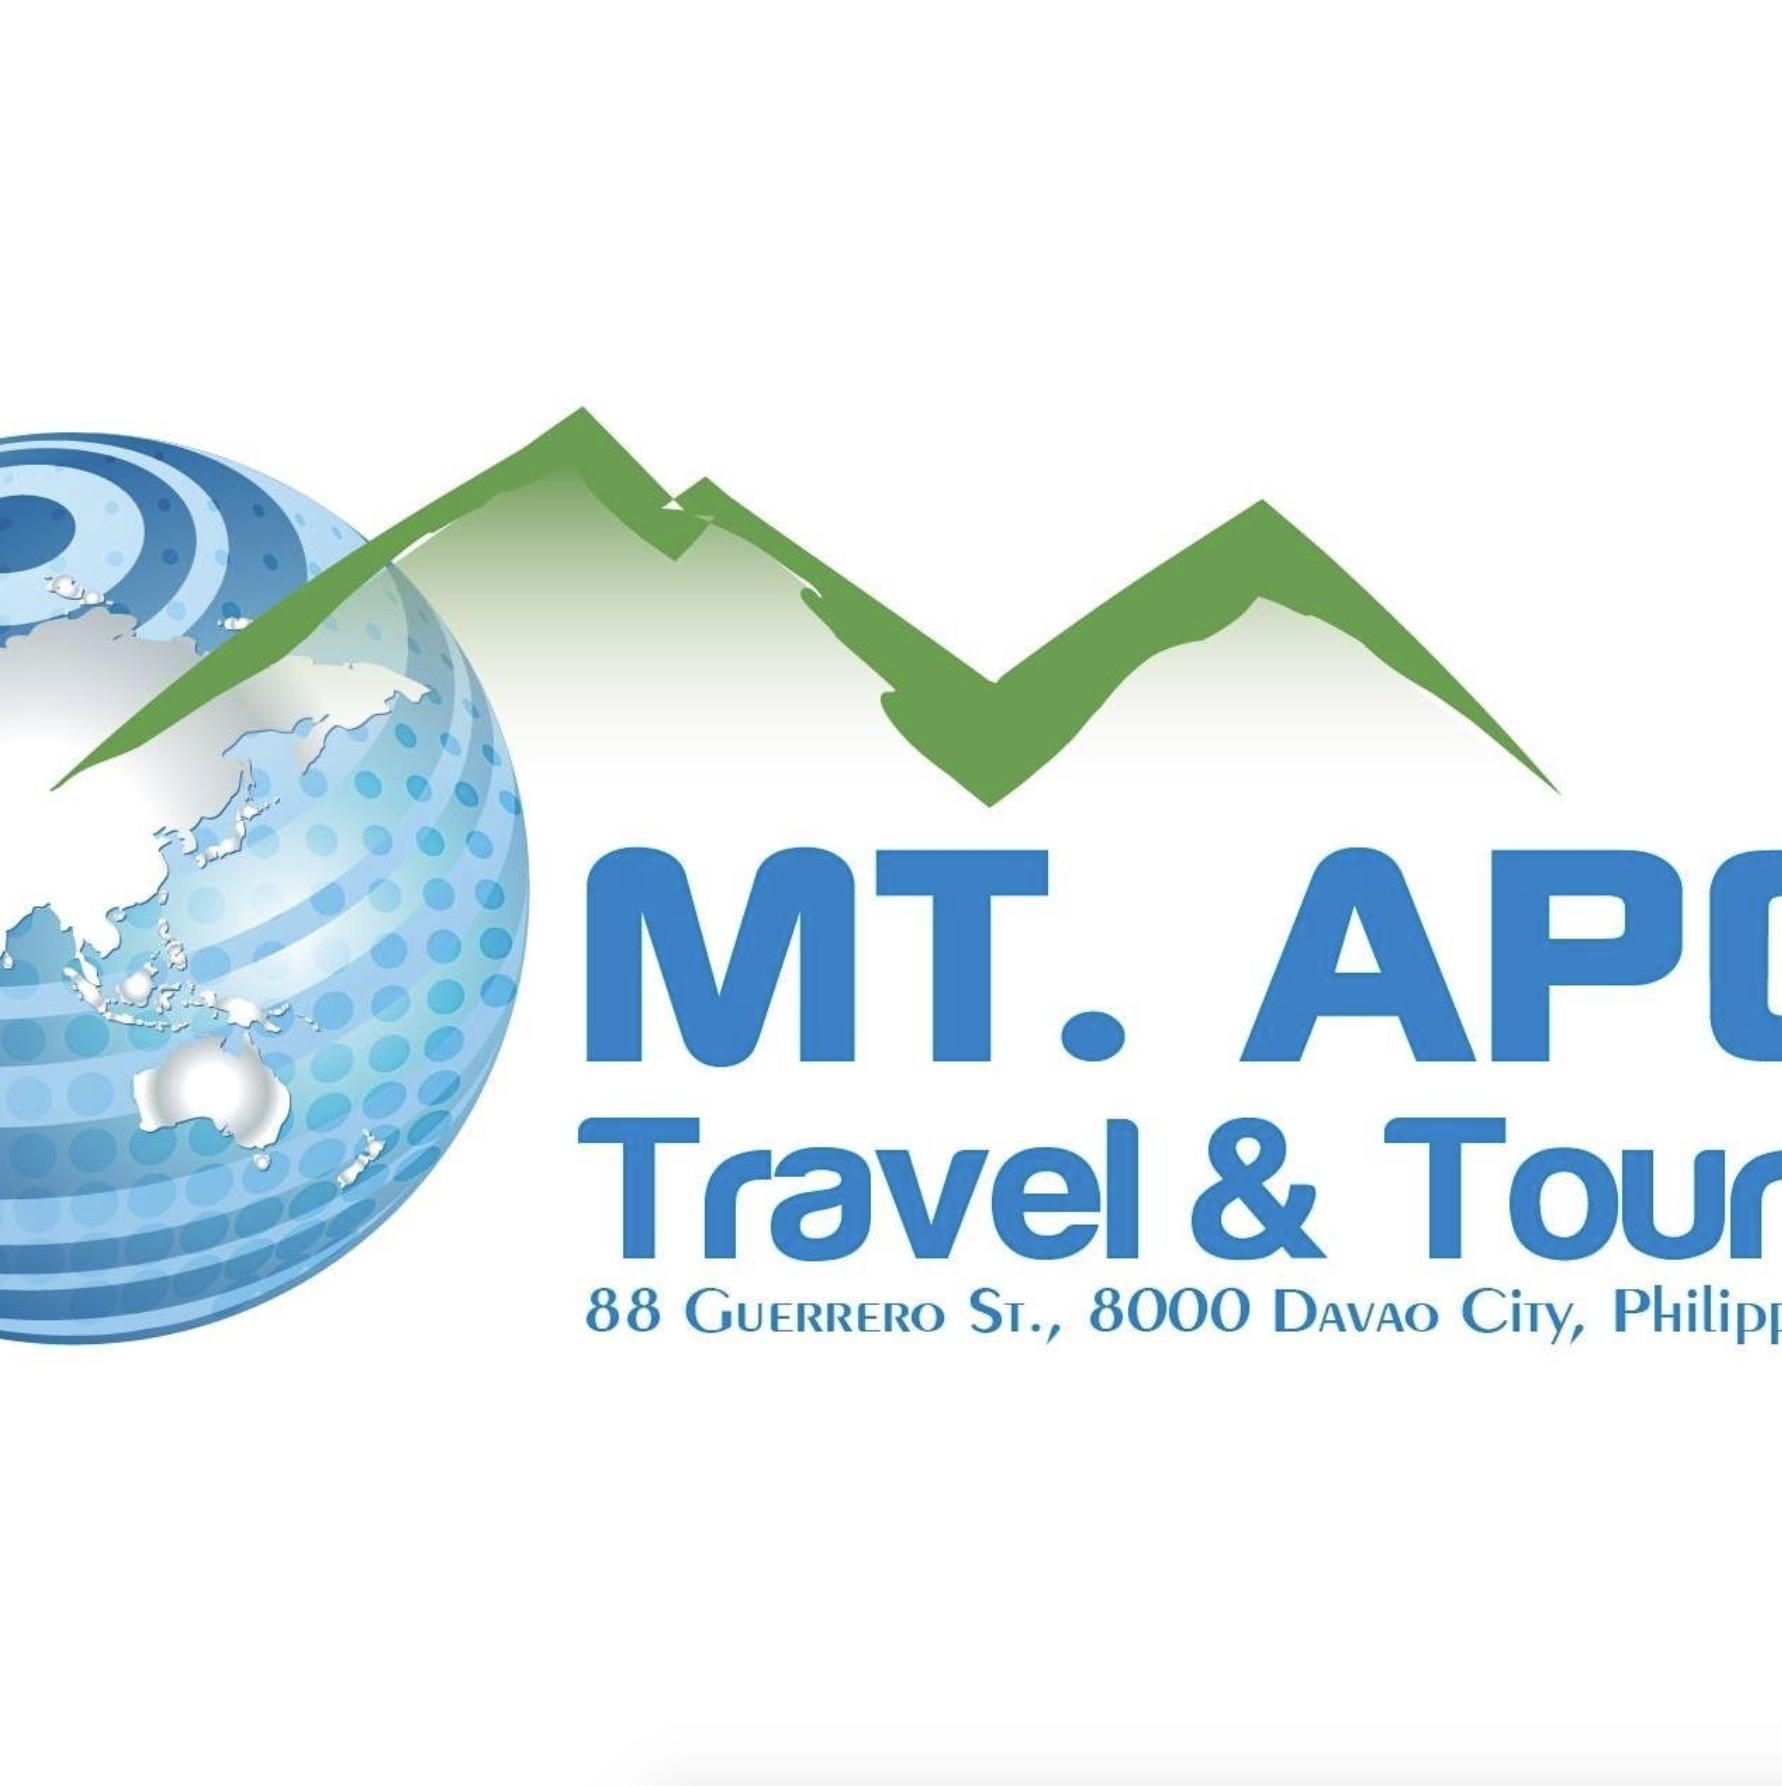 https://tourism.davaocity.gov.ph/wp-content/uploads/2019/12/Screen-Shot-2019-12-16-at-11.22.18-AM.png